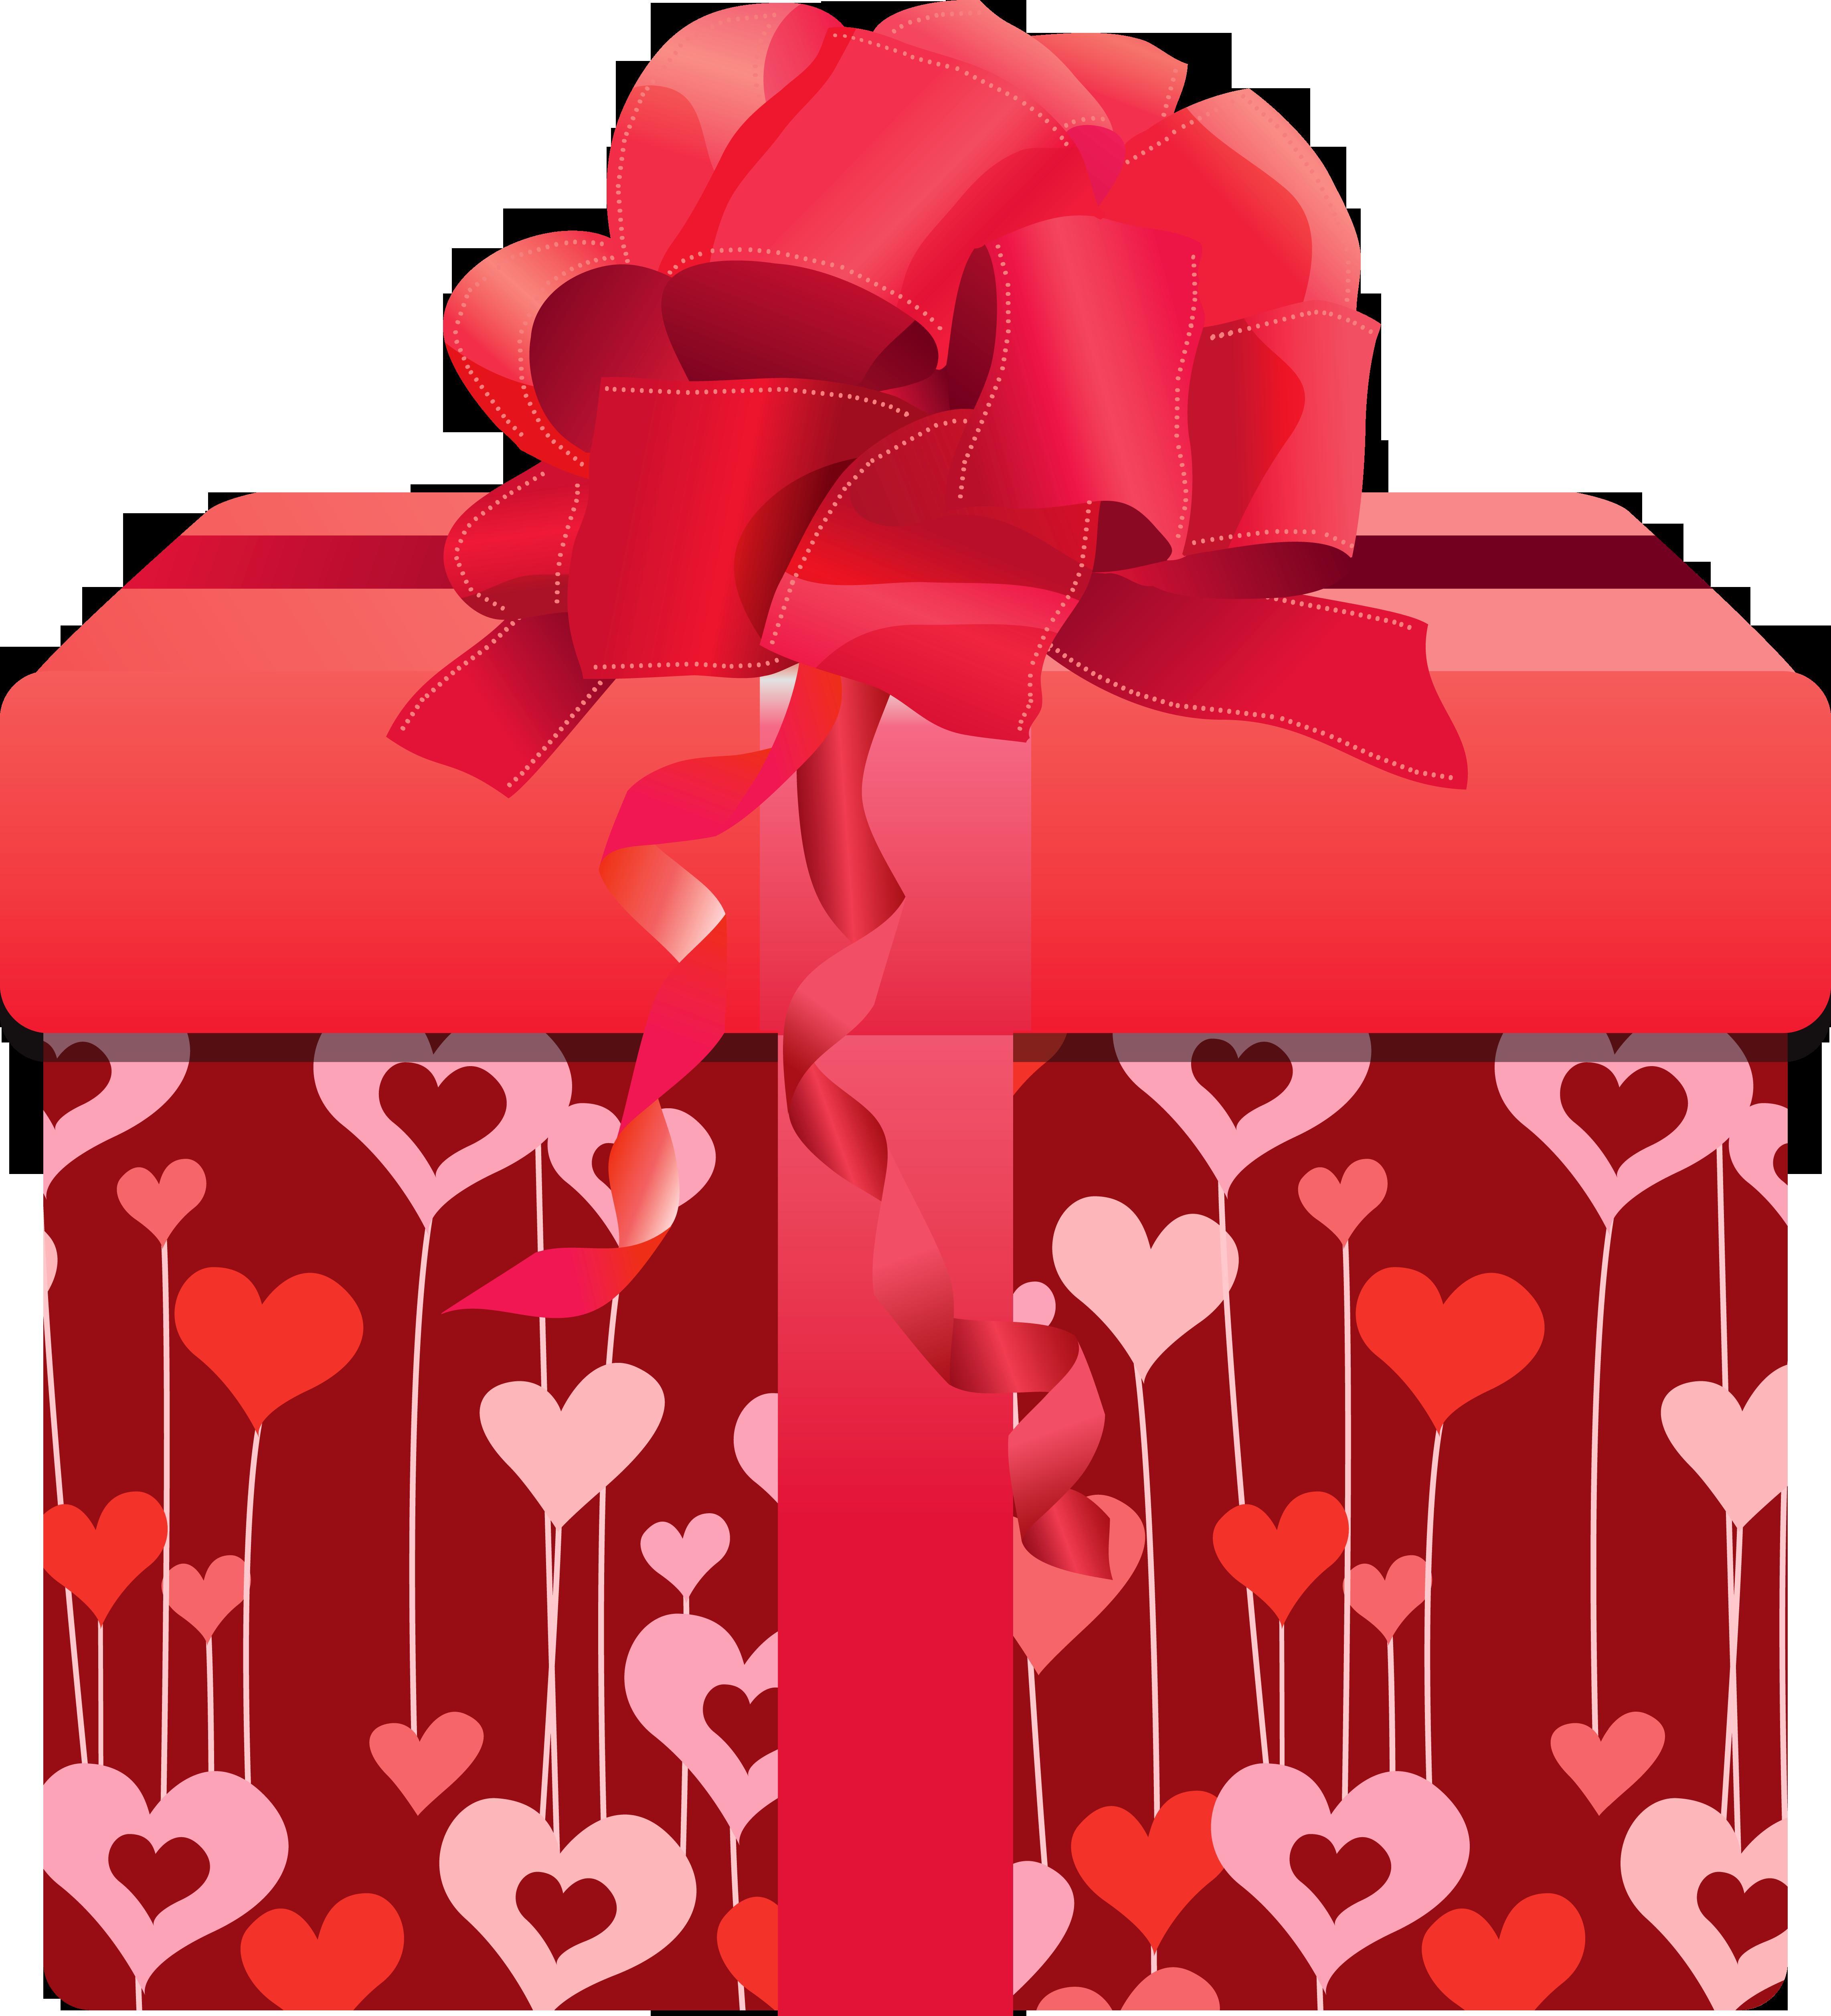 Фото или картинки коробки с подарком